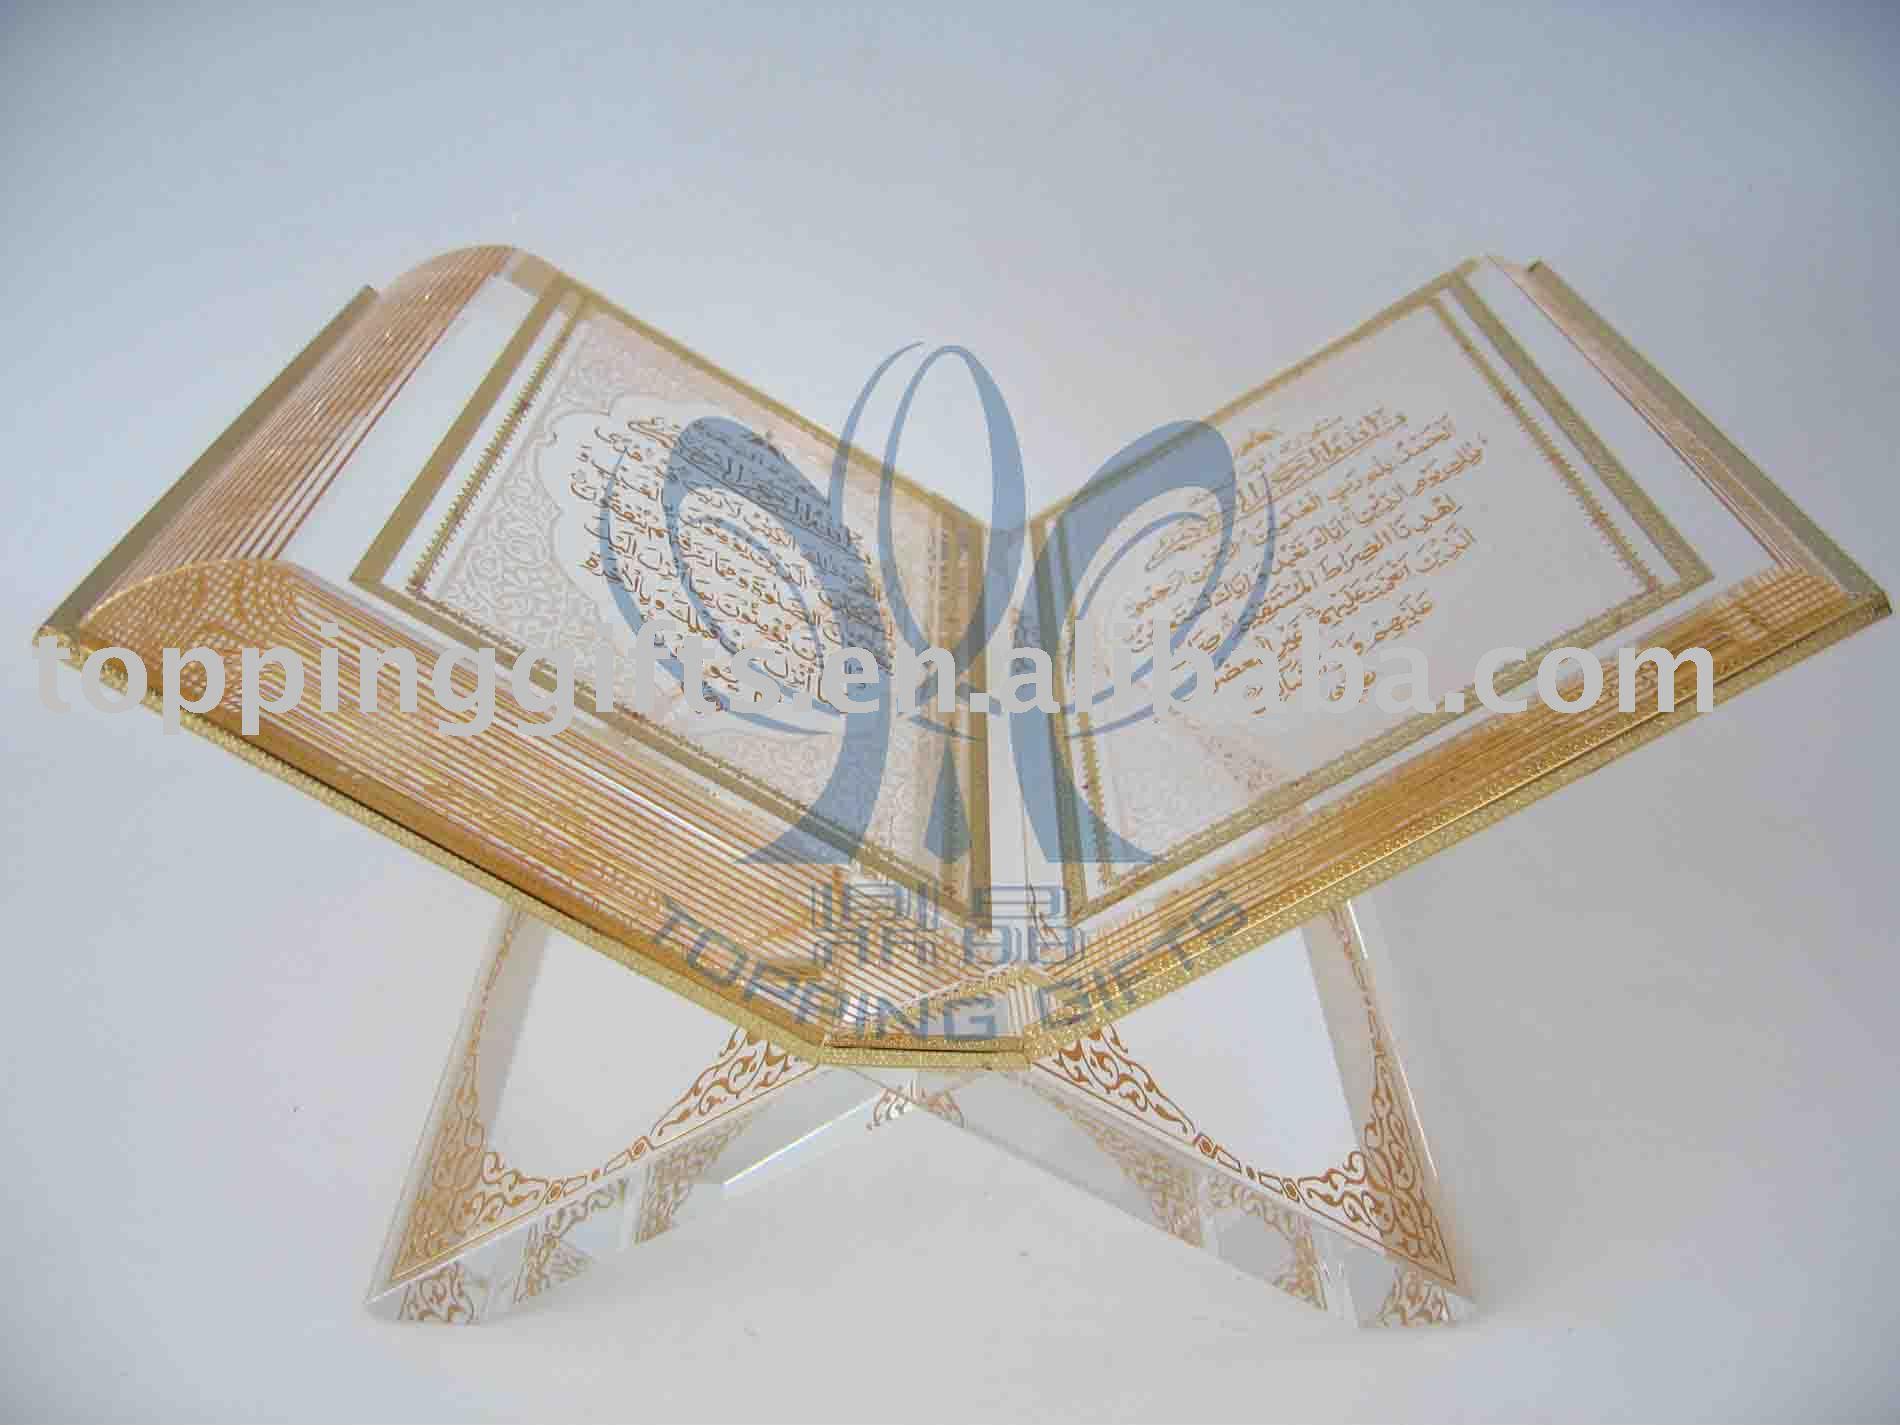 Crystal Quran, Crystal Quran Suppliers and Manufacturers at Alibaba.com